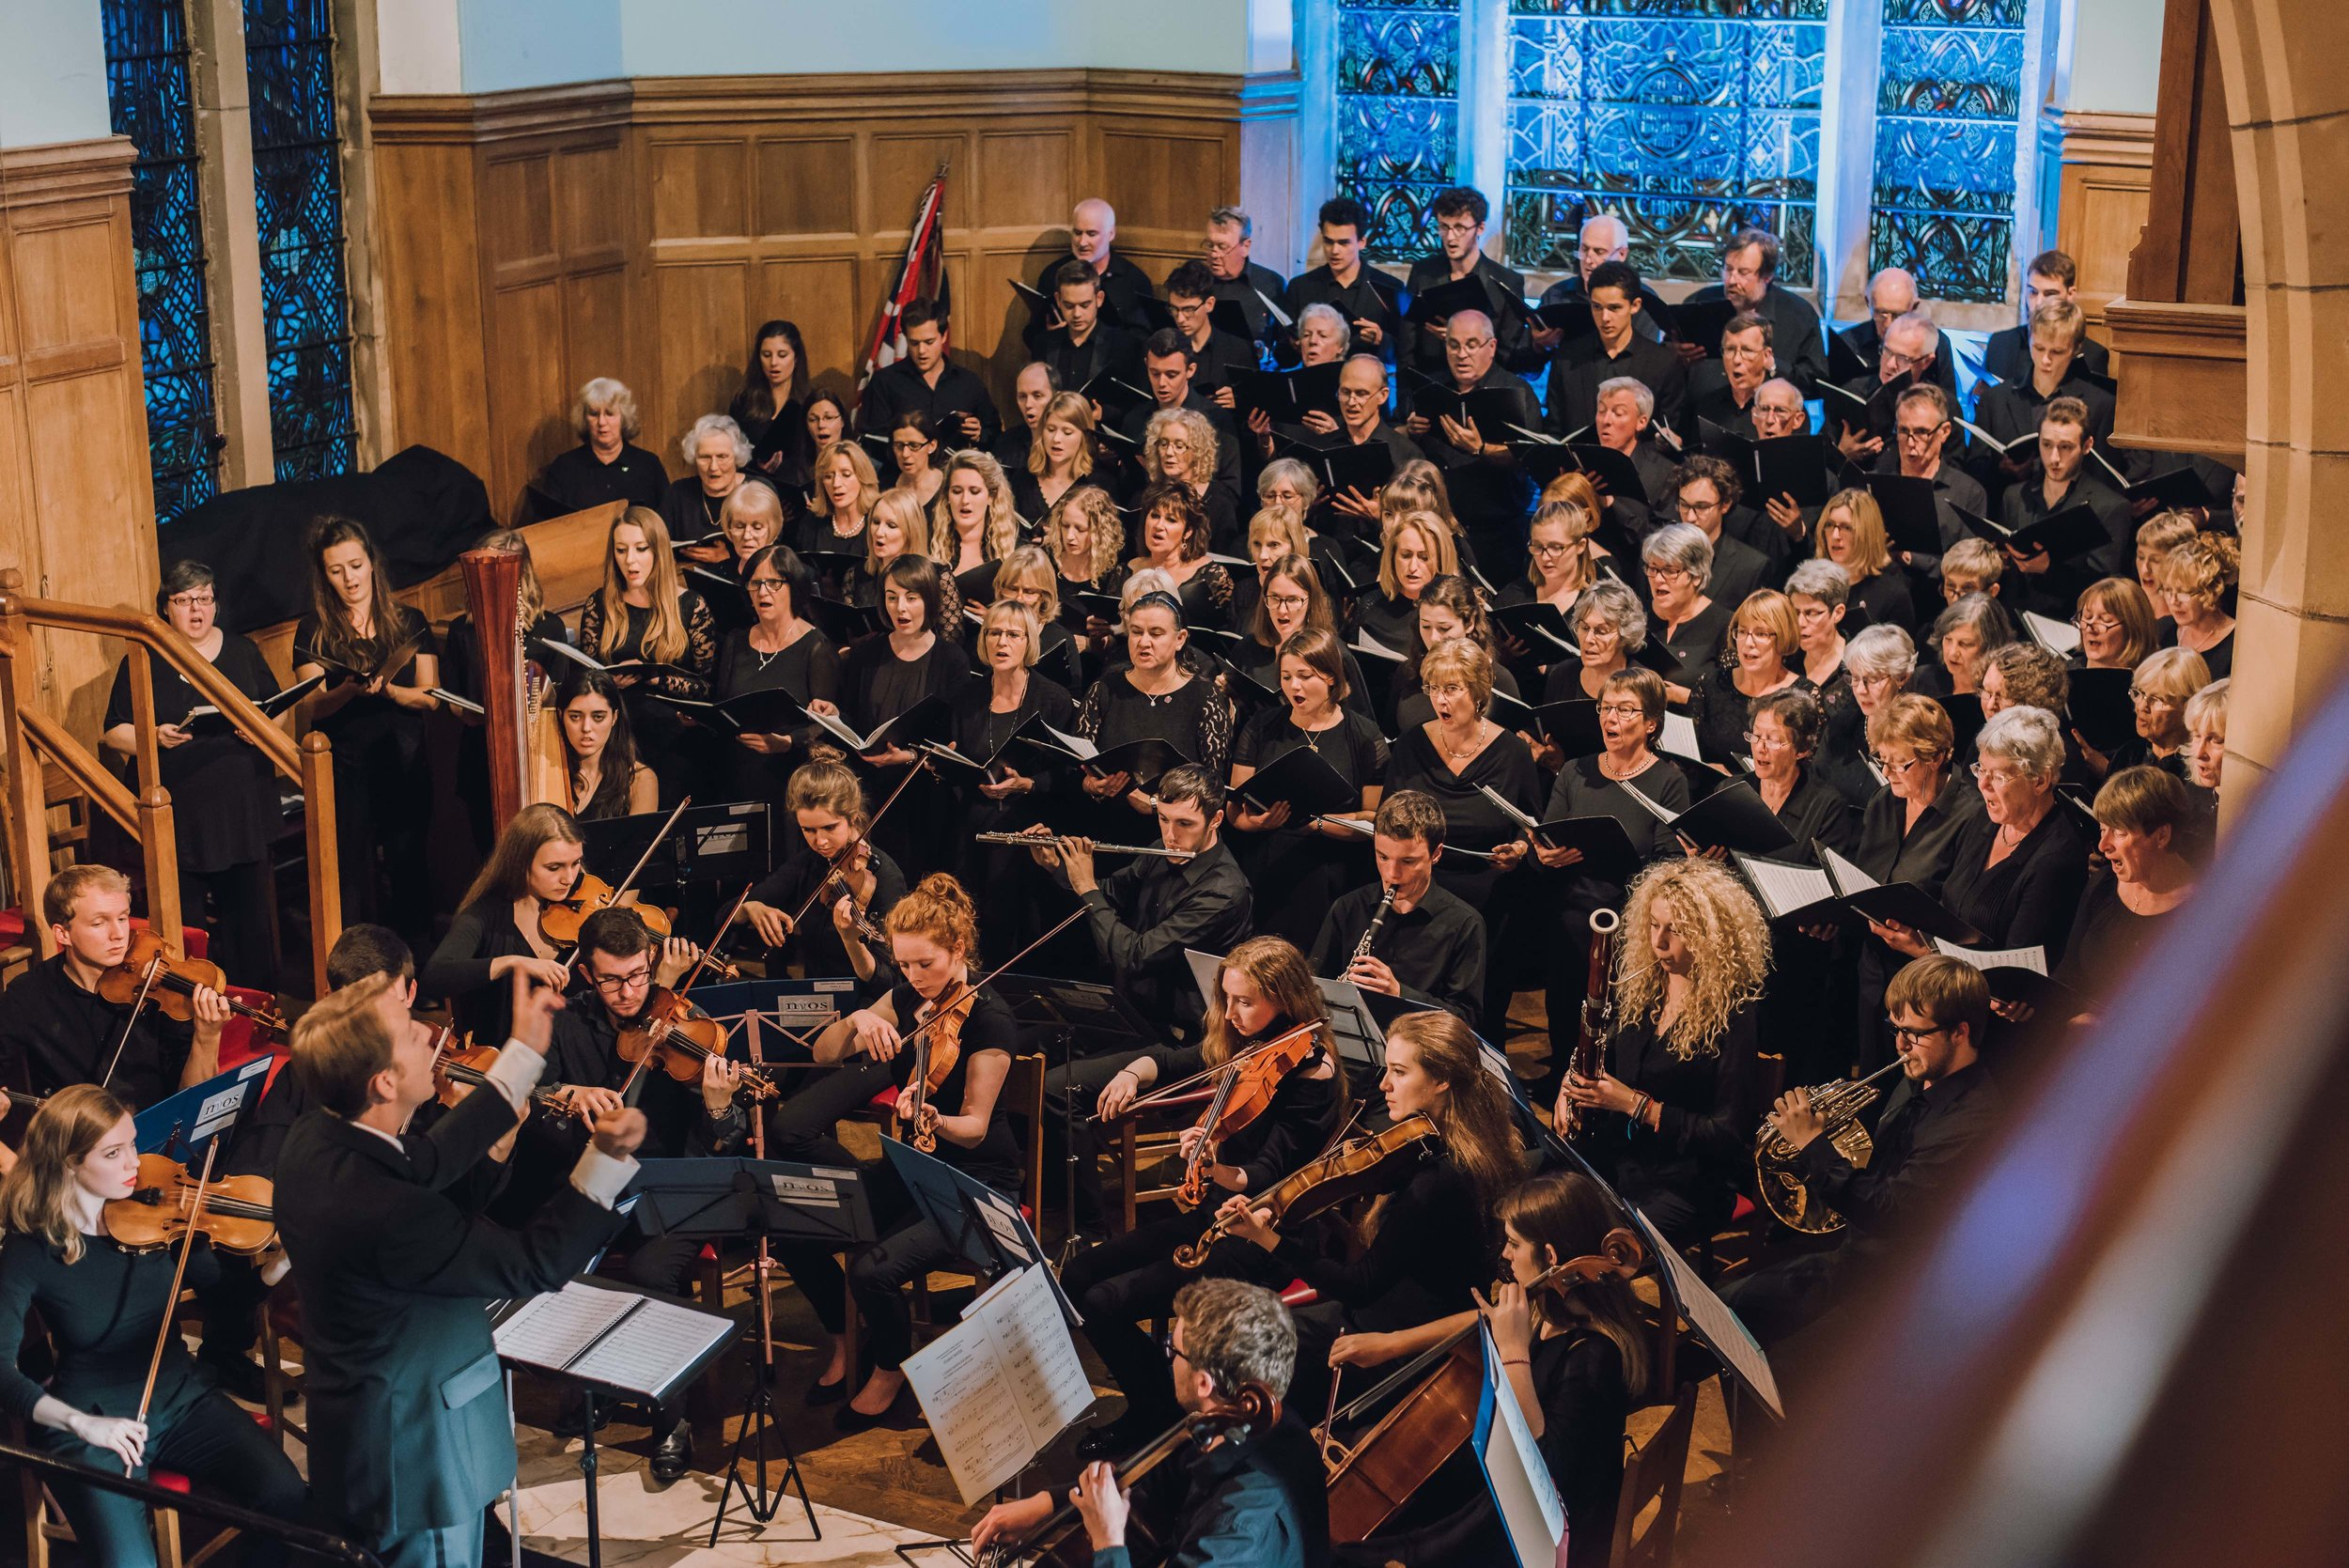 2016 Cumnock Tryst Festival Chorus conducted by Eamonn Dougan. photo Mihaela Bodlovic (2).jpg